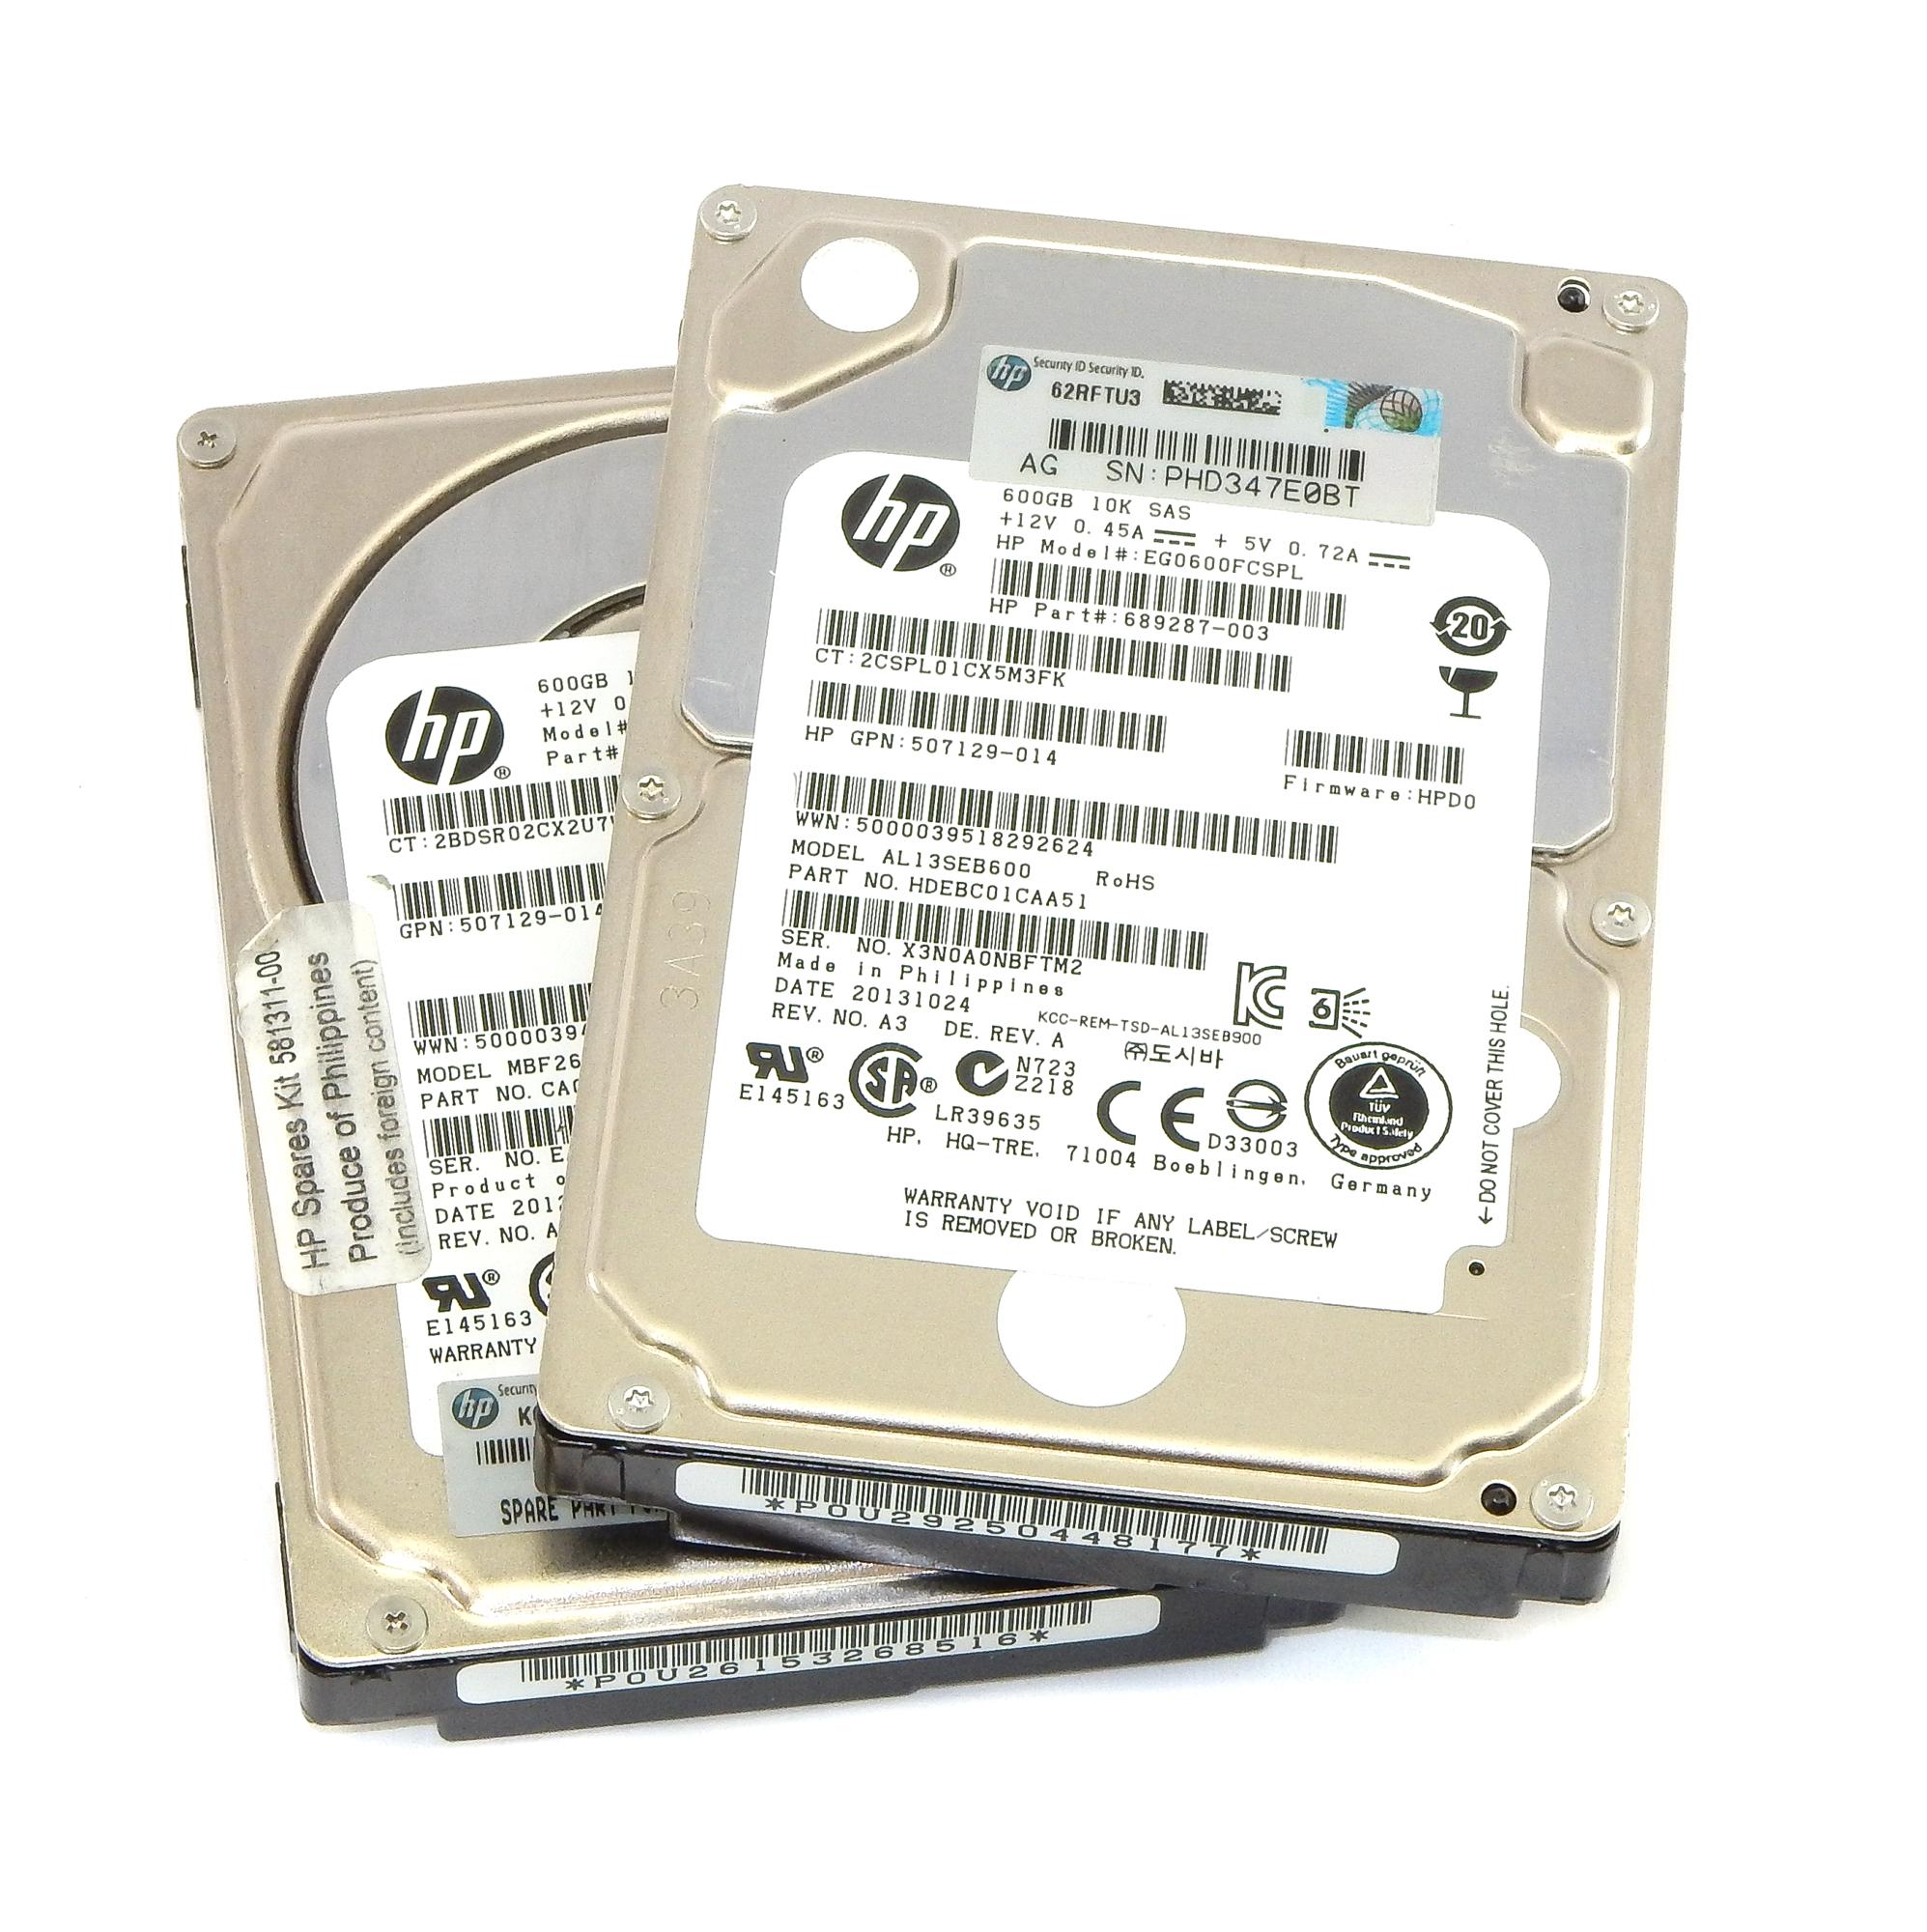 "2x HP 507129-014 EG0600FCSPL 600GB 10K SAS 2.5"" Hard Disk Drive"